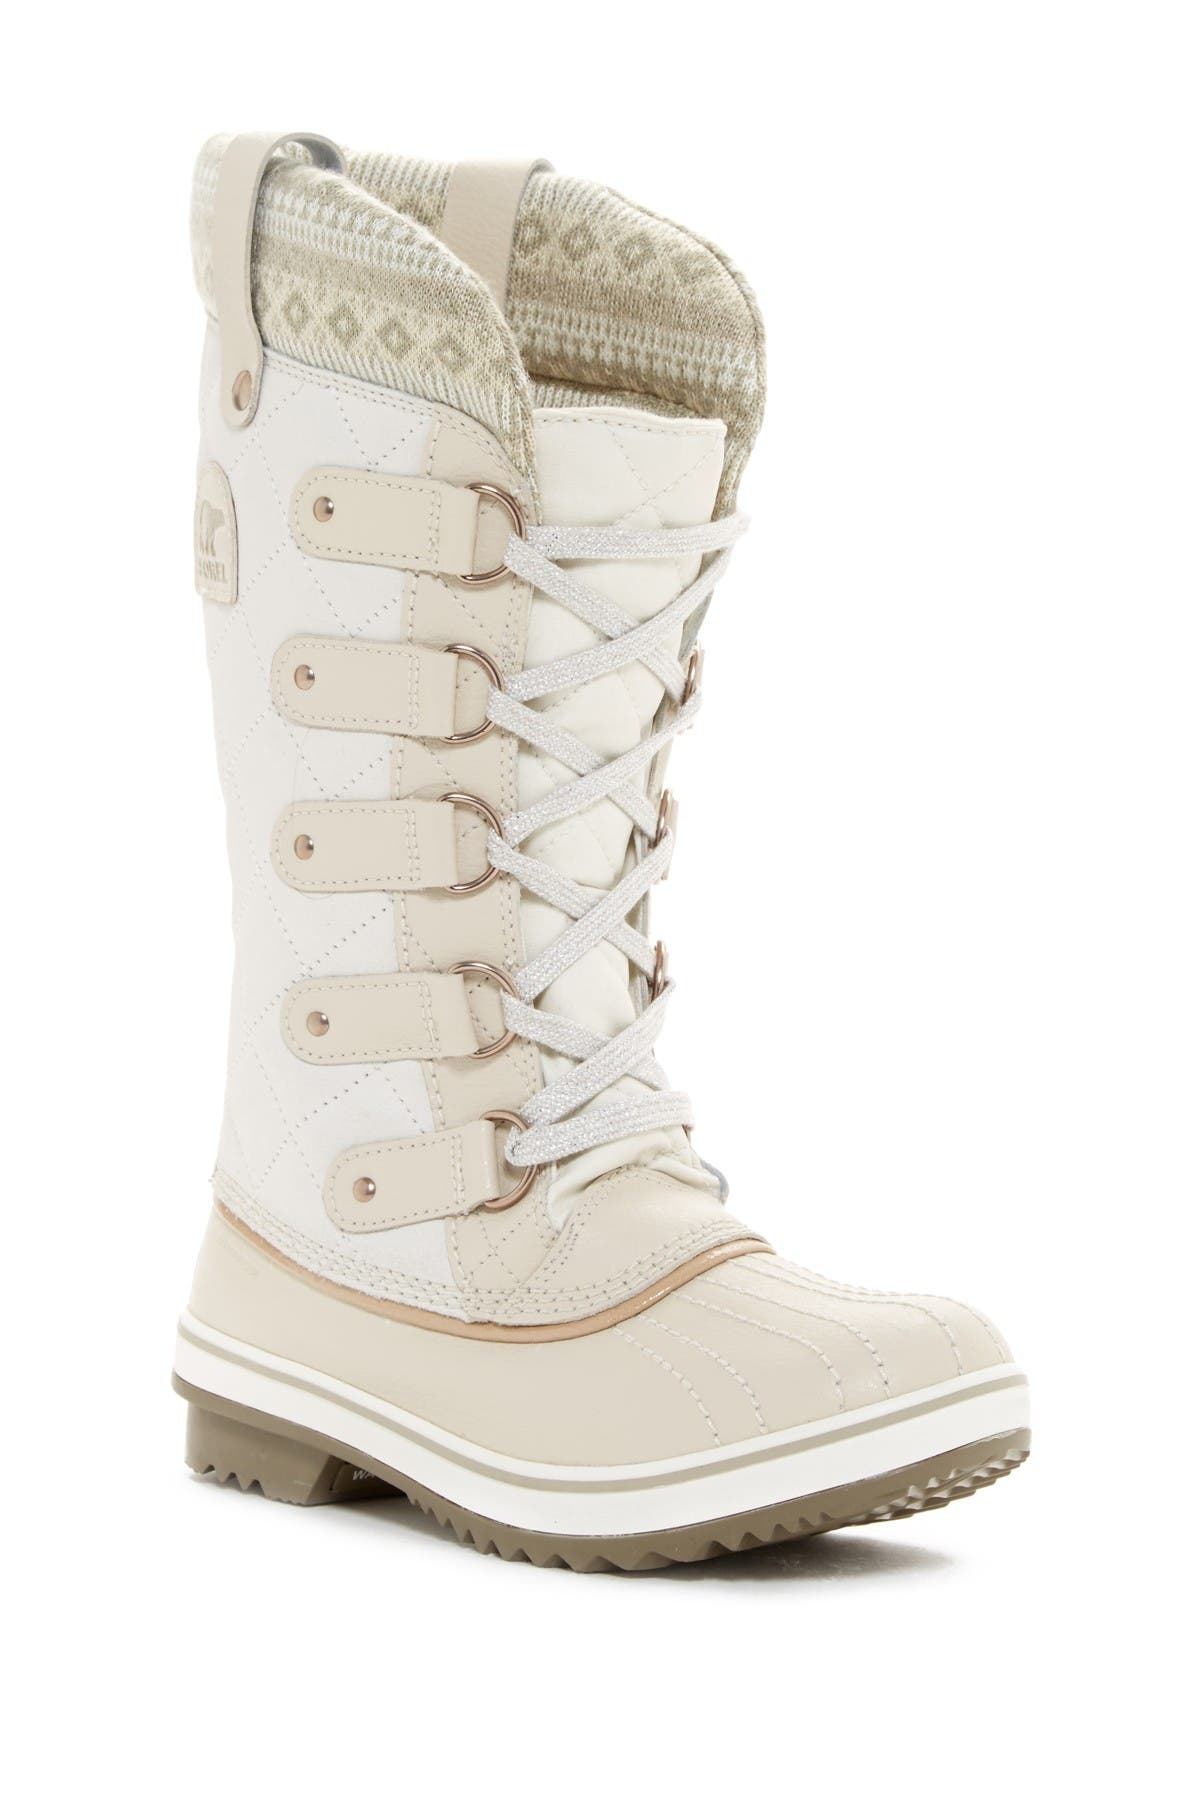 Sorel | Tofino Holiday Waterproof Boot